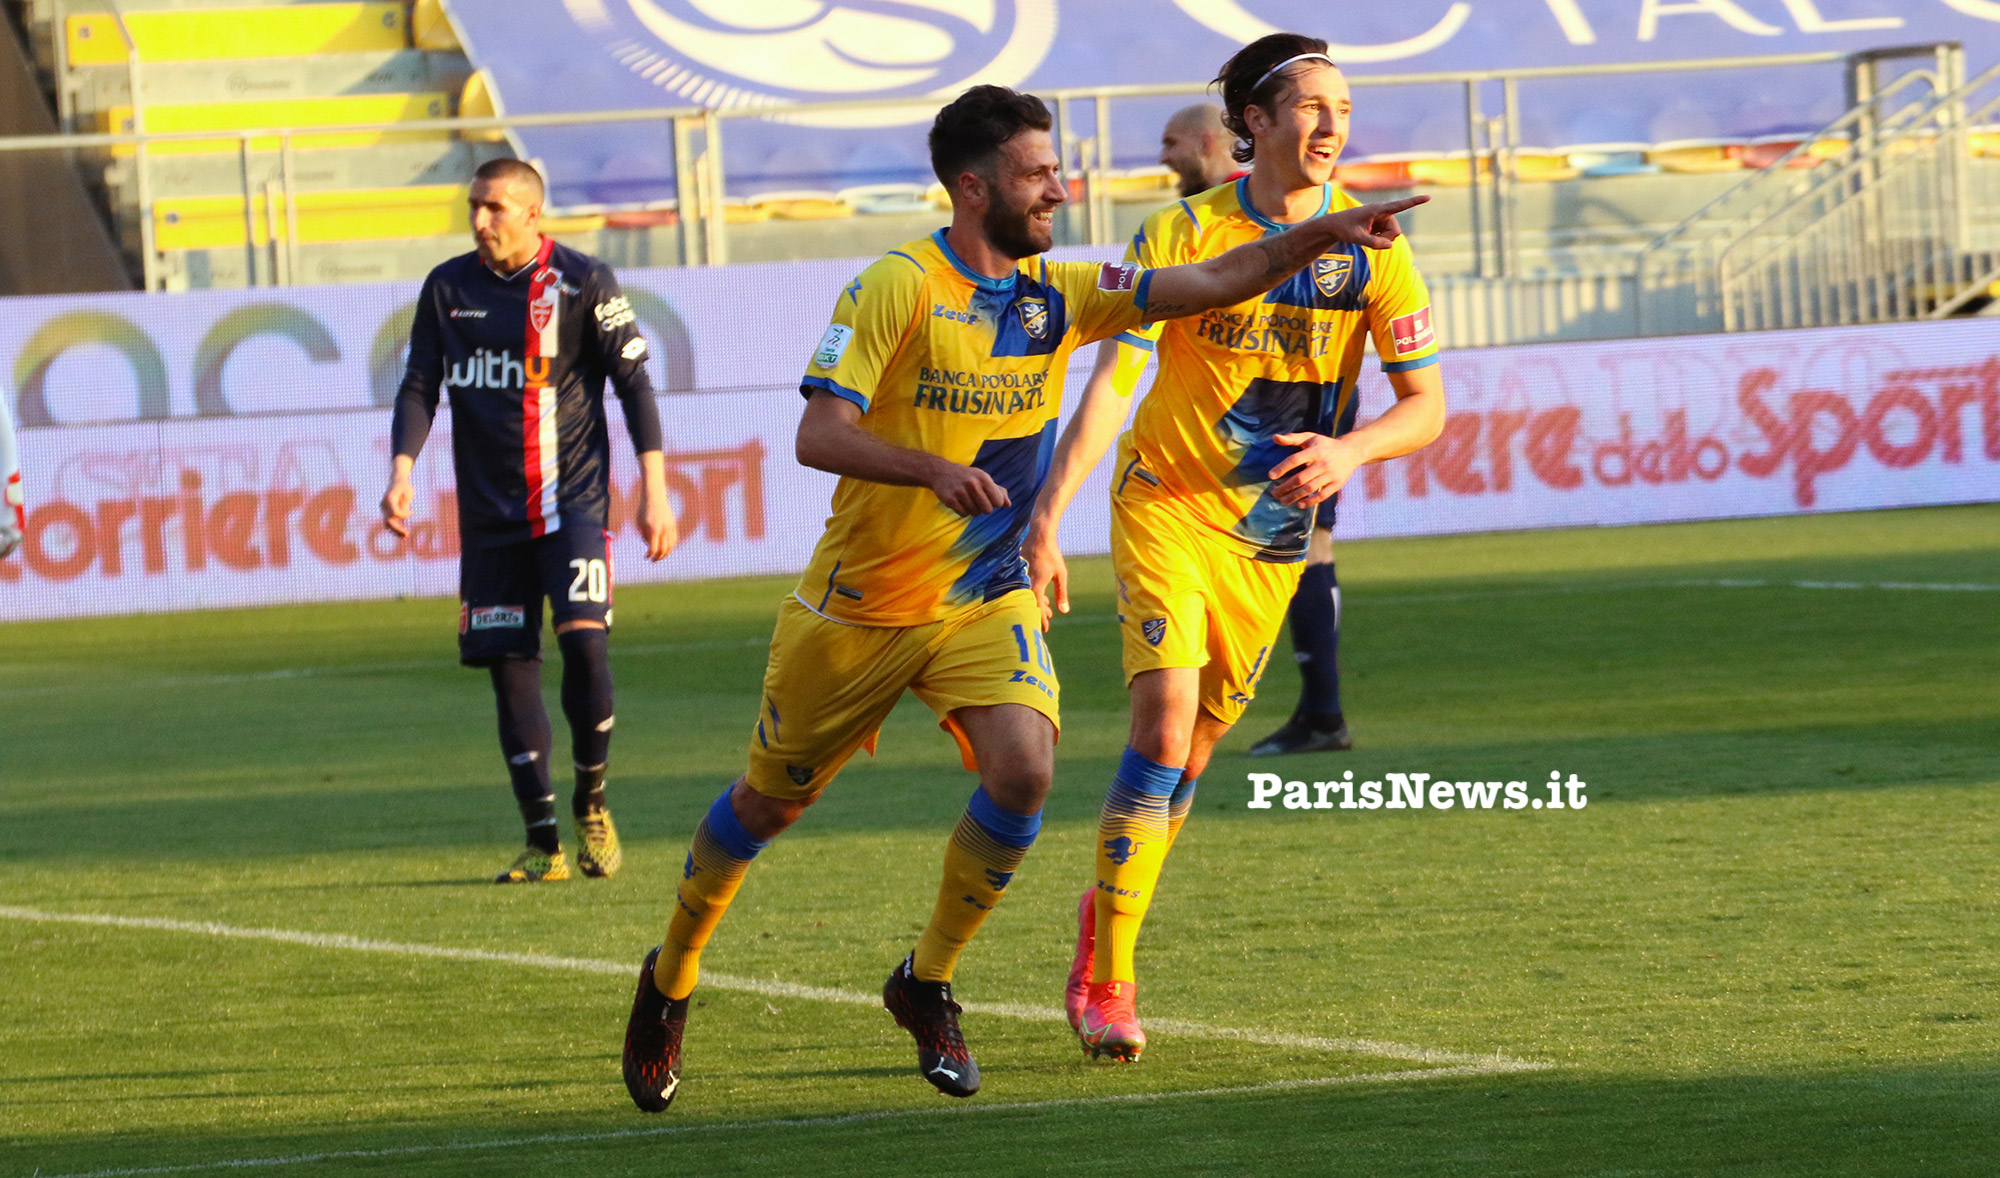 Frosinone - Monza 2-2